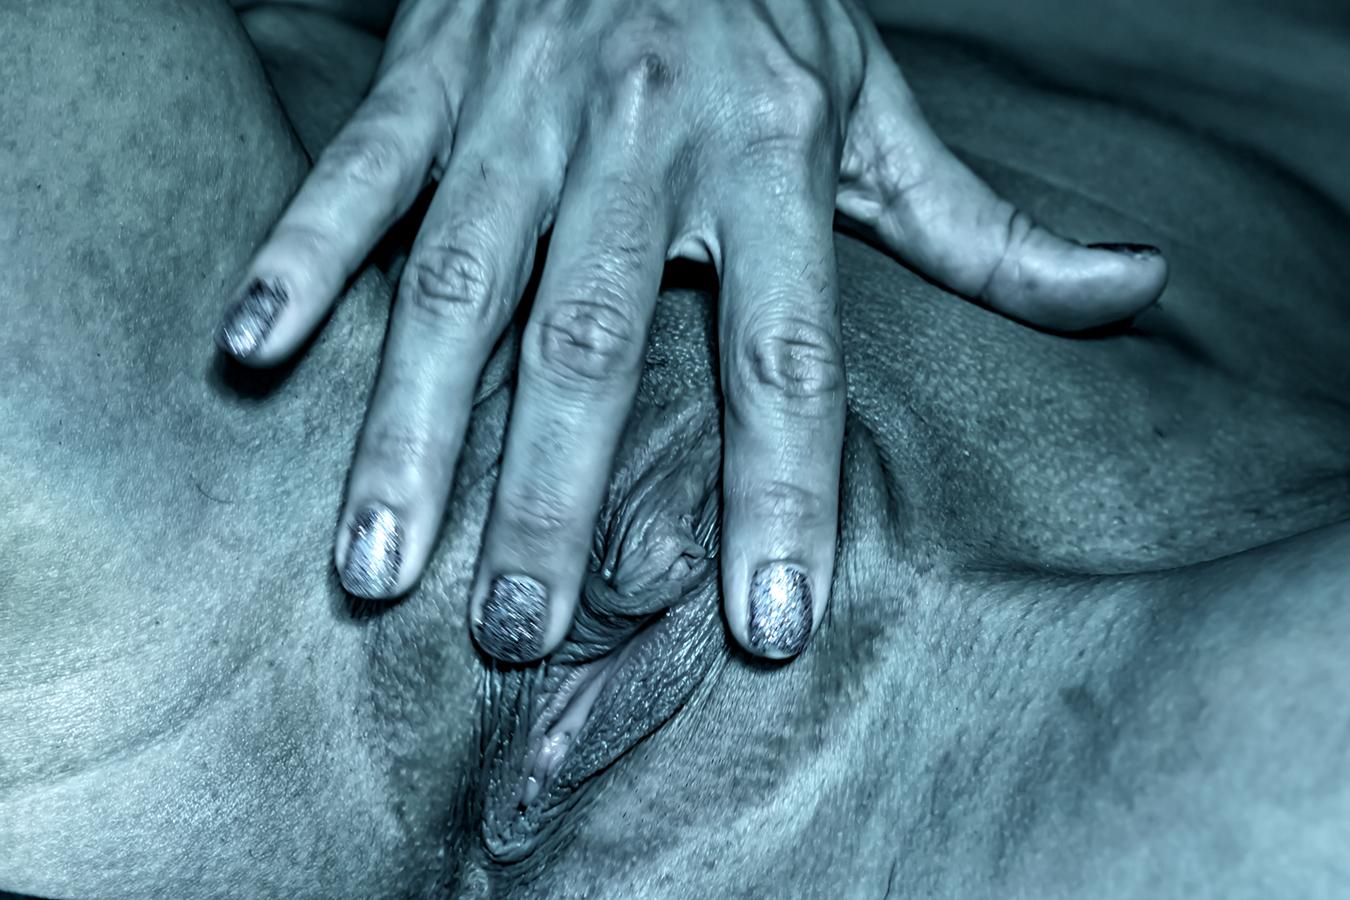 charles i. letbetter - the obscenity of art